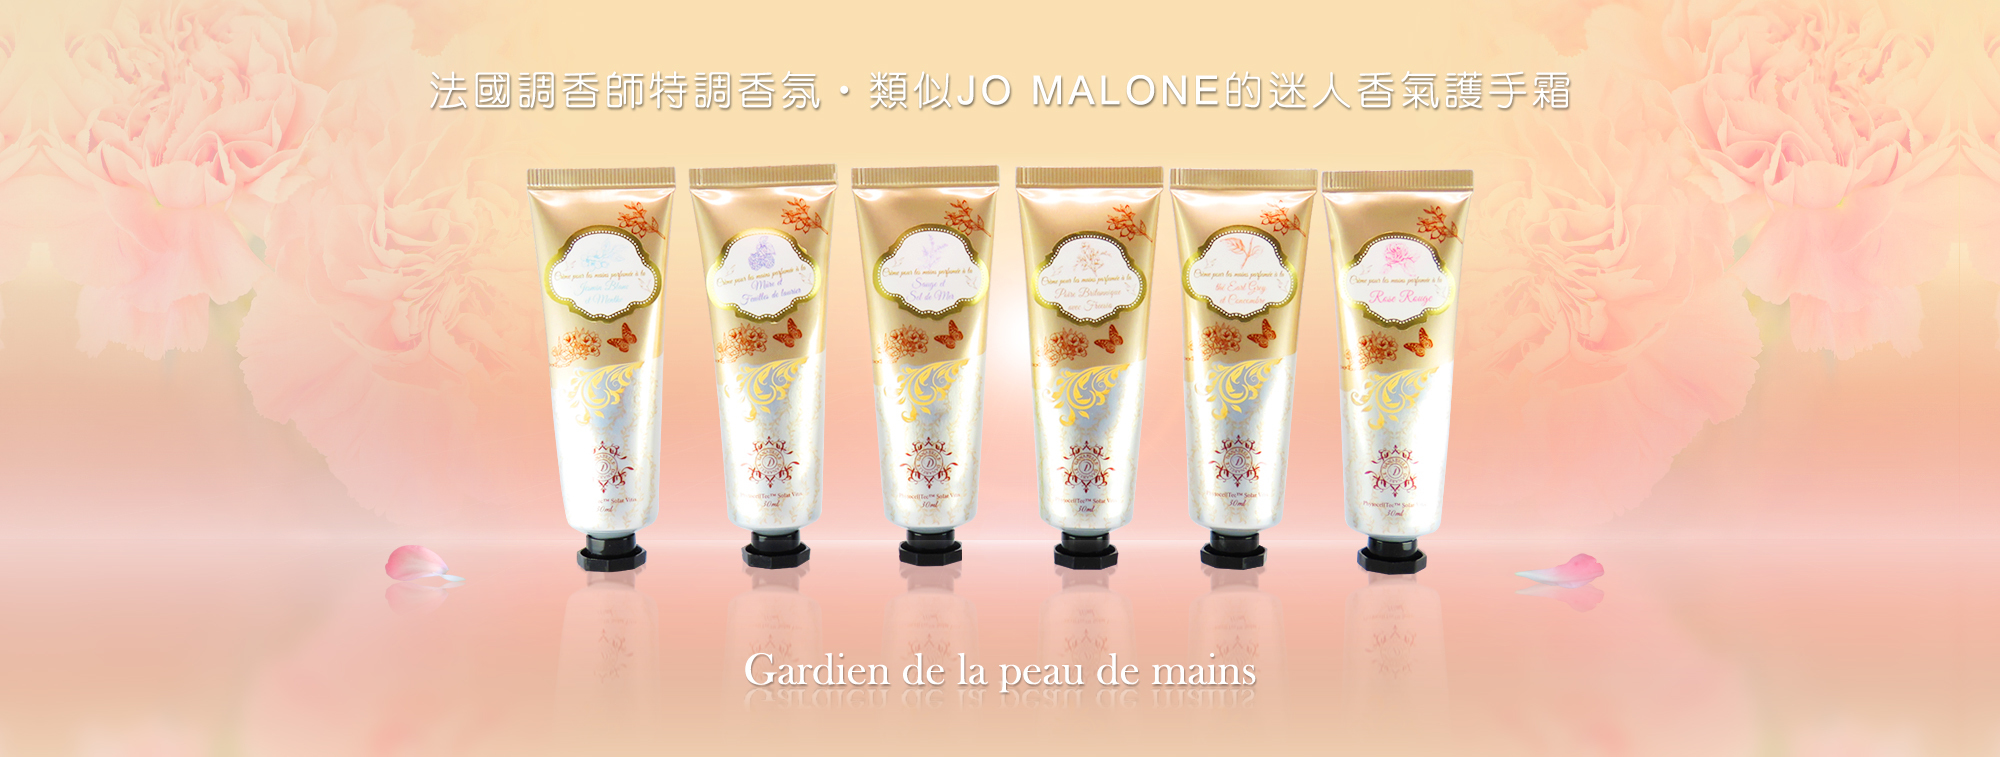 DANA BELLE 生醫美妝,肌膚保養,來自瑞士法國專利技術,專屬於您手部肌膚的守護者